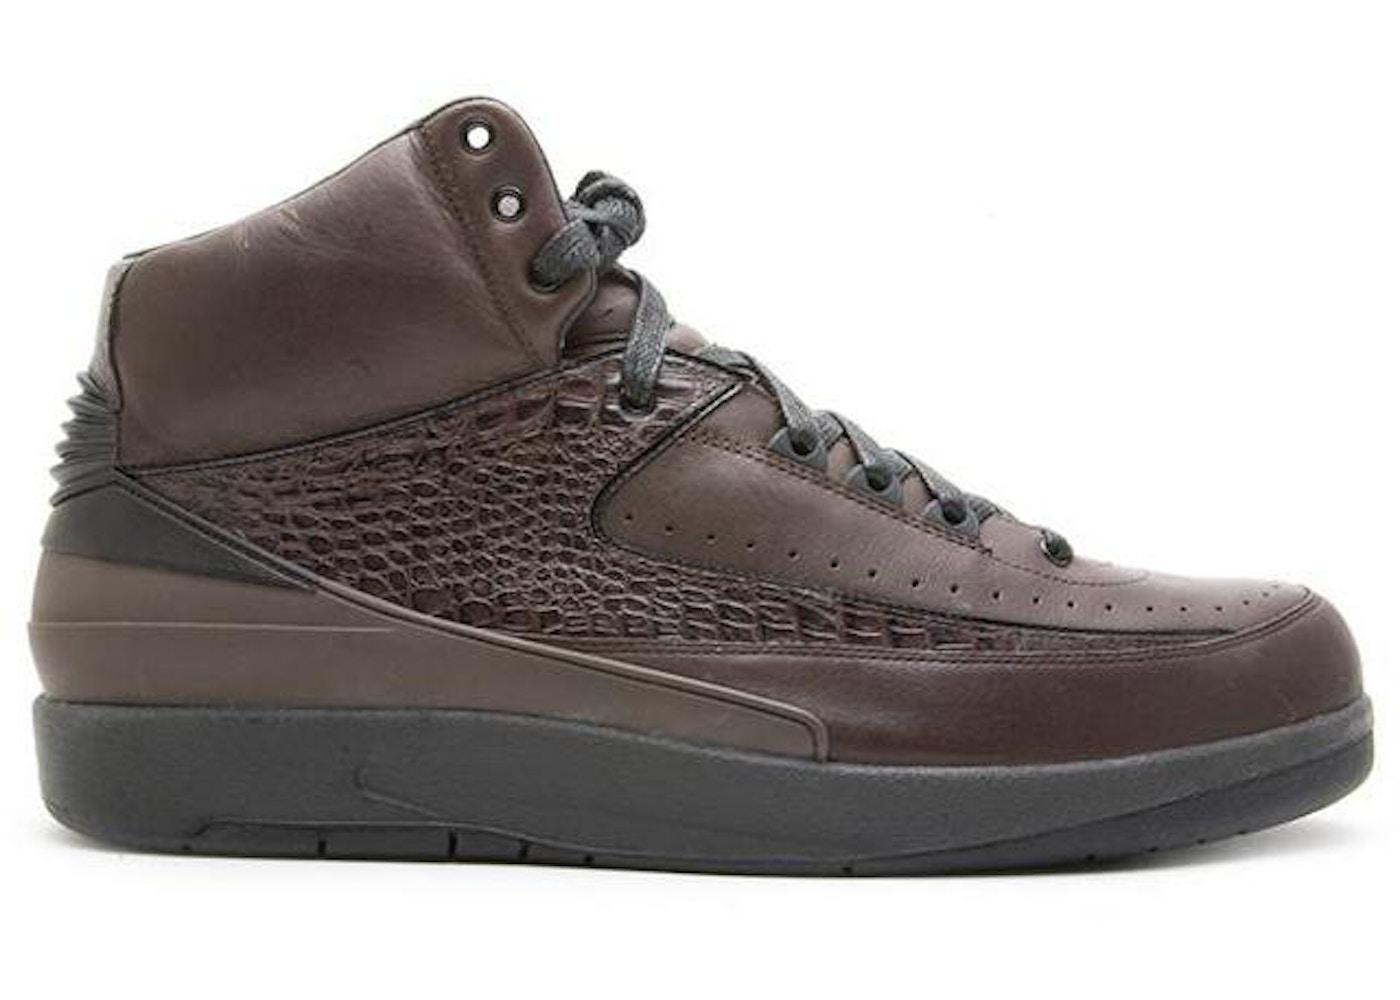 finest selection adff6 7caa9 Air Jordan 2 Shoes - Last Sale